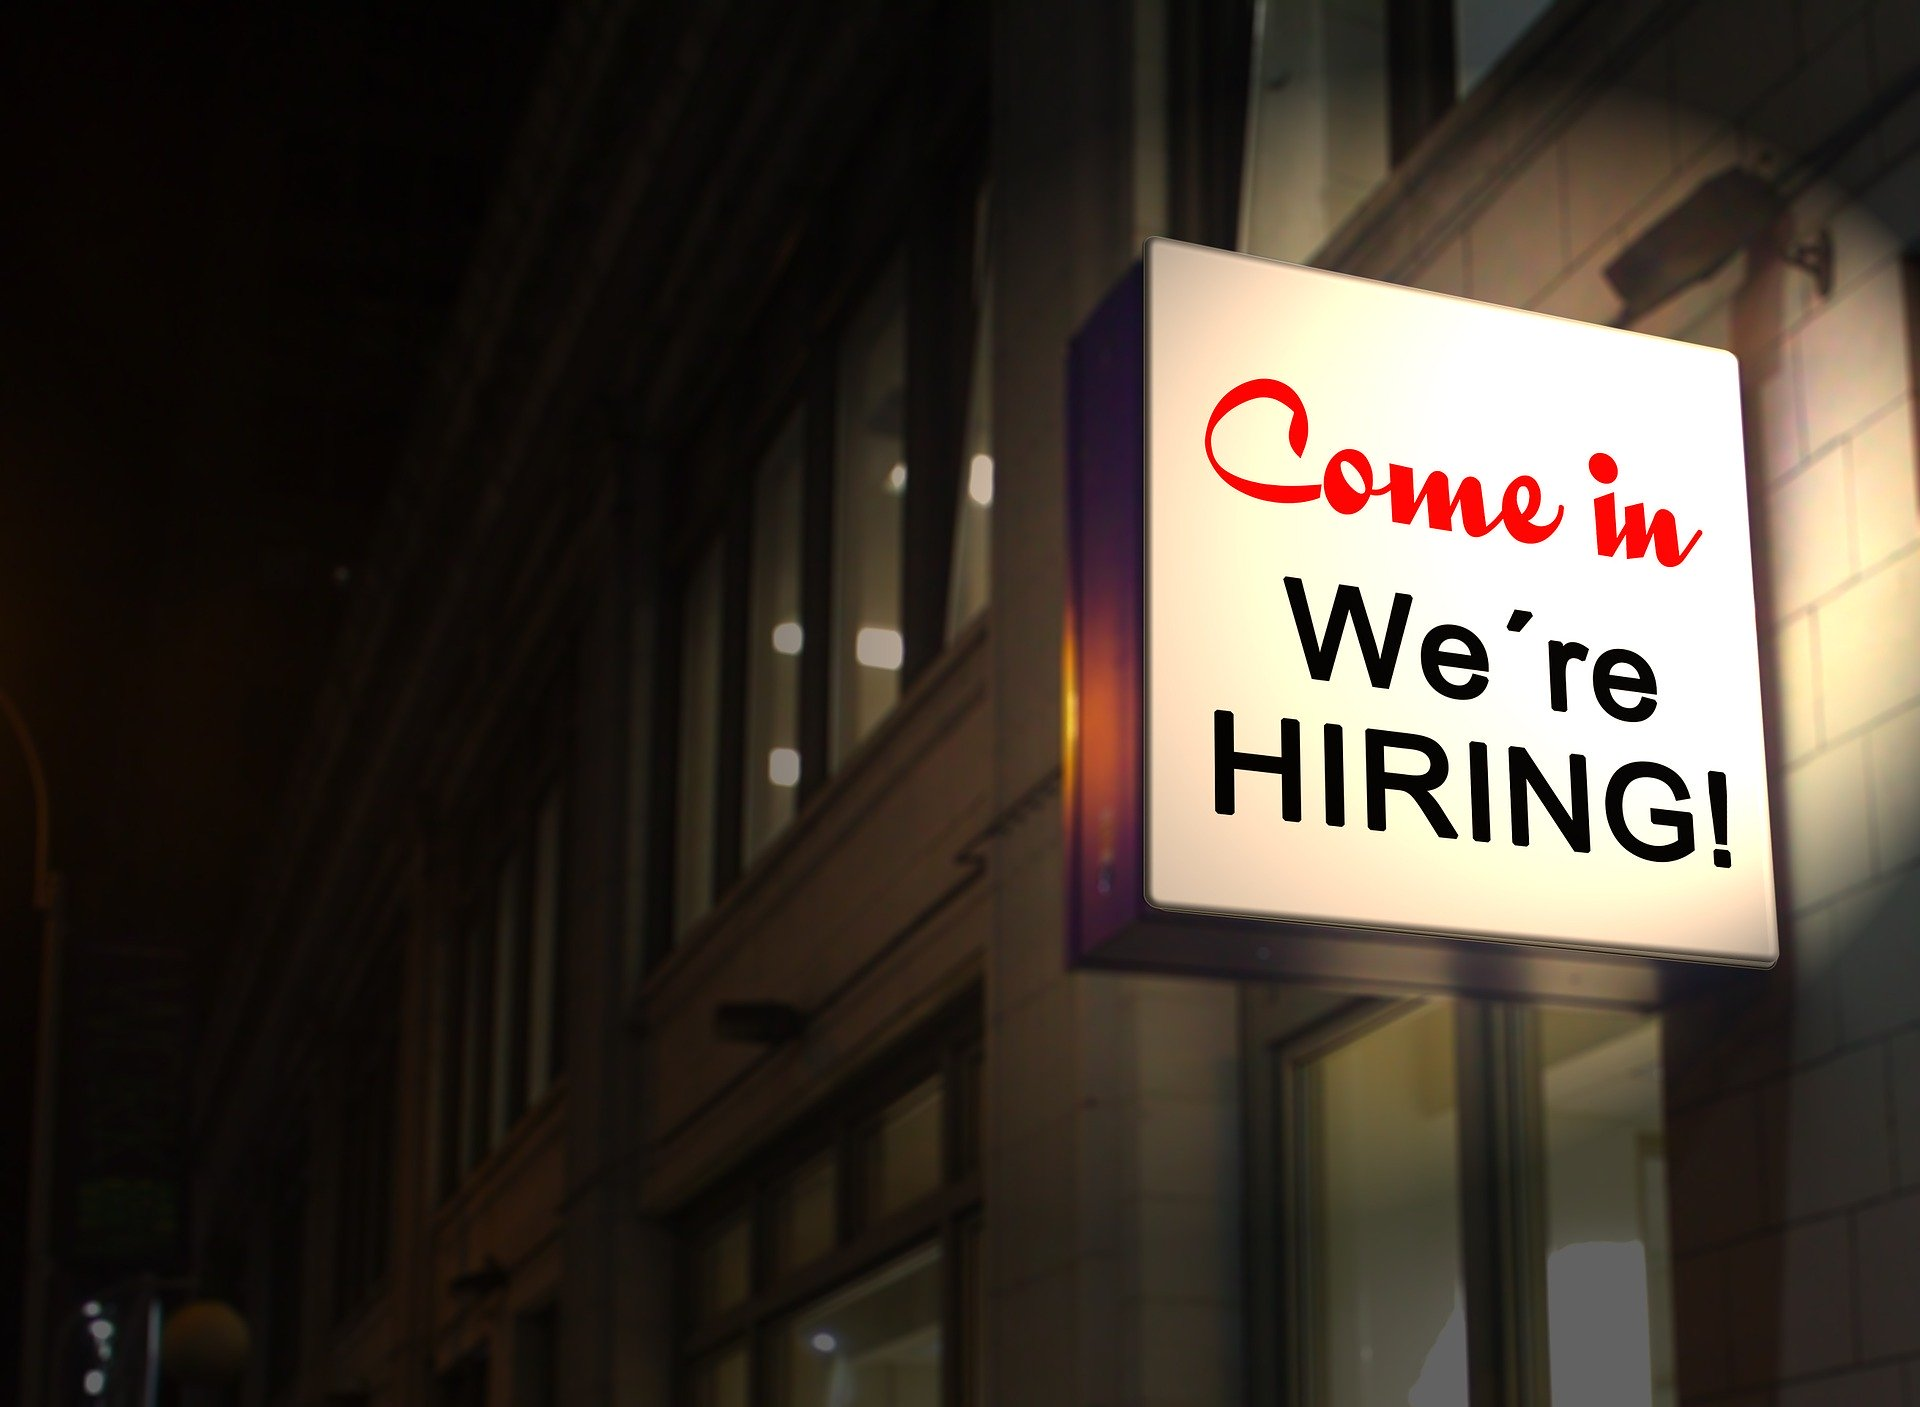 we're hiring sign